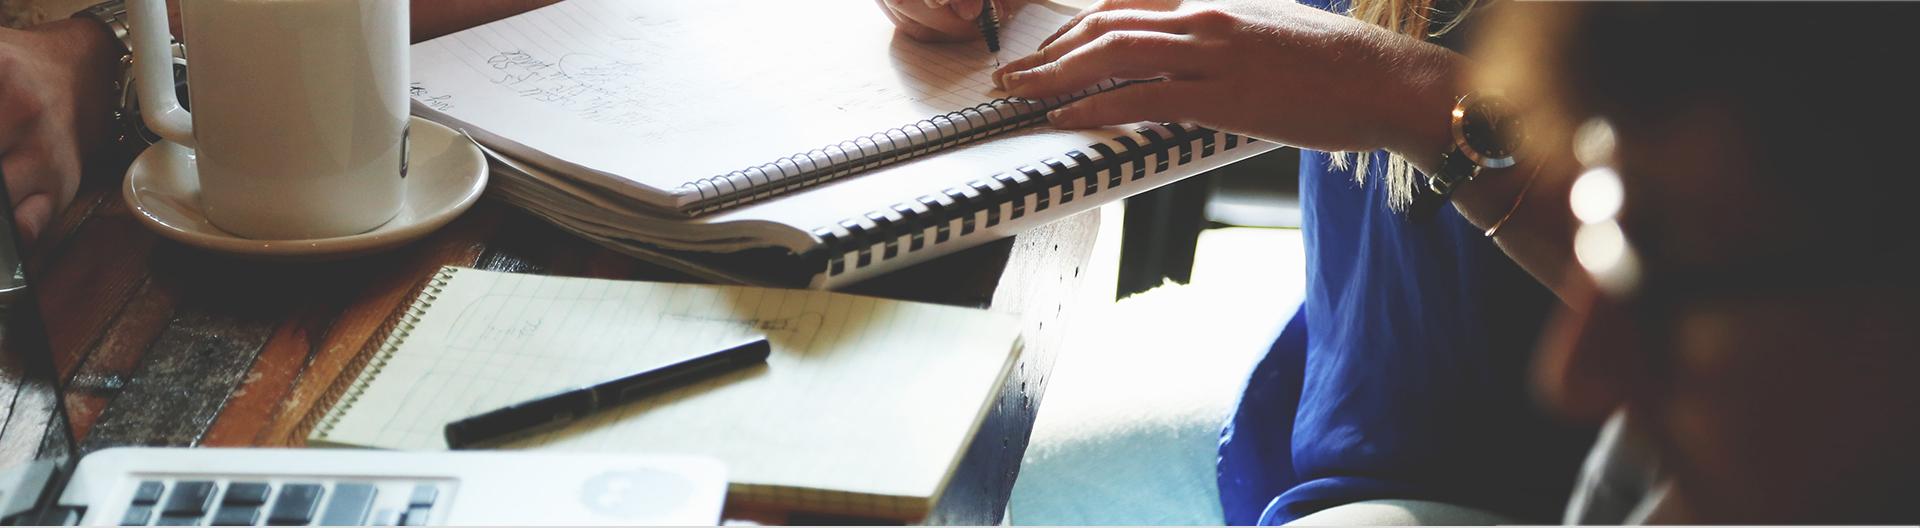 Girl writing notes on her study table with coffee mug